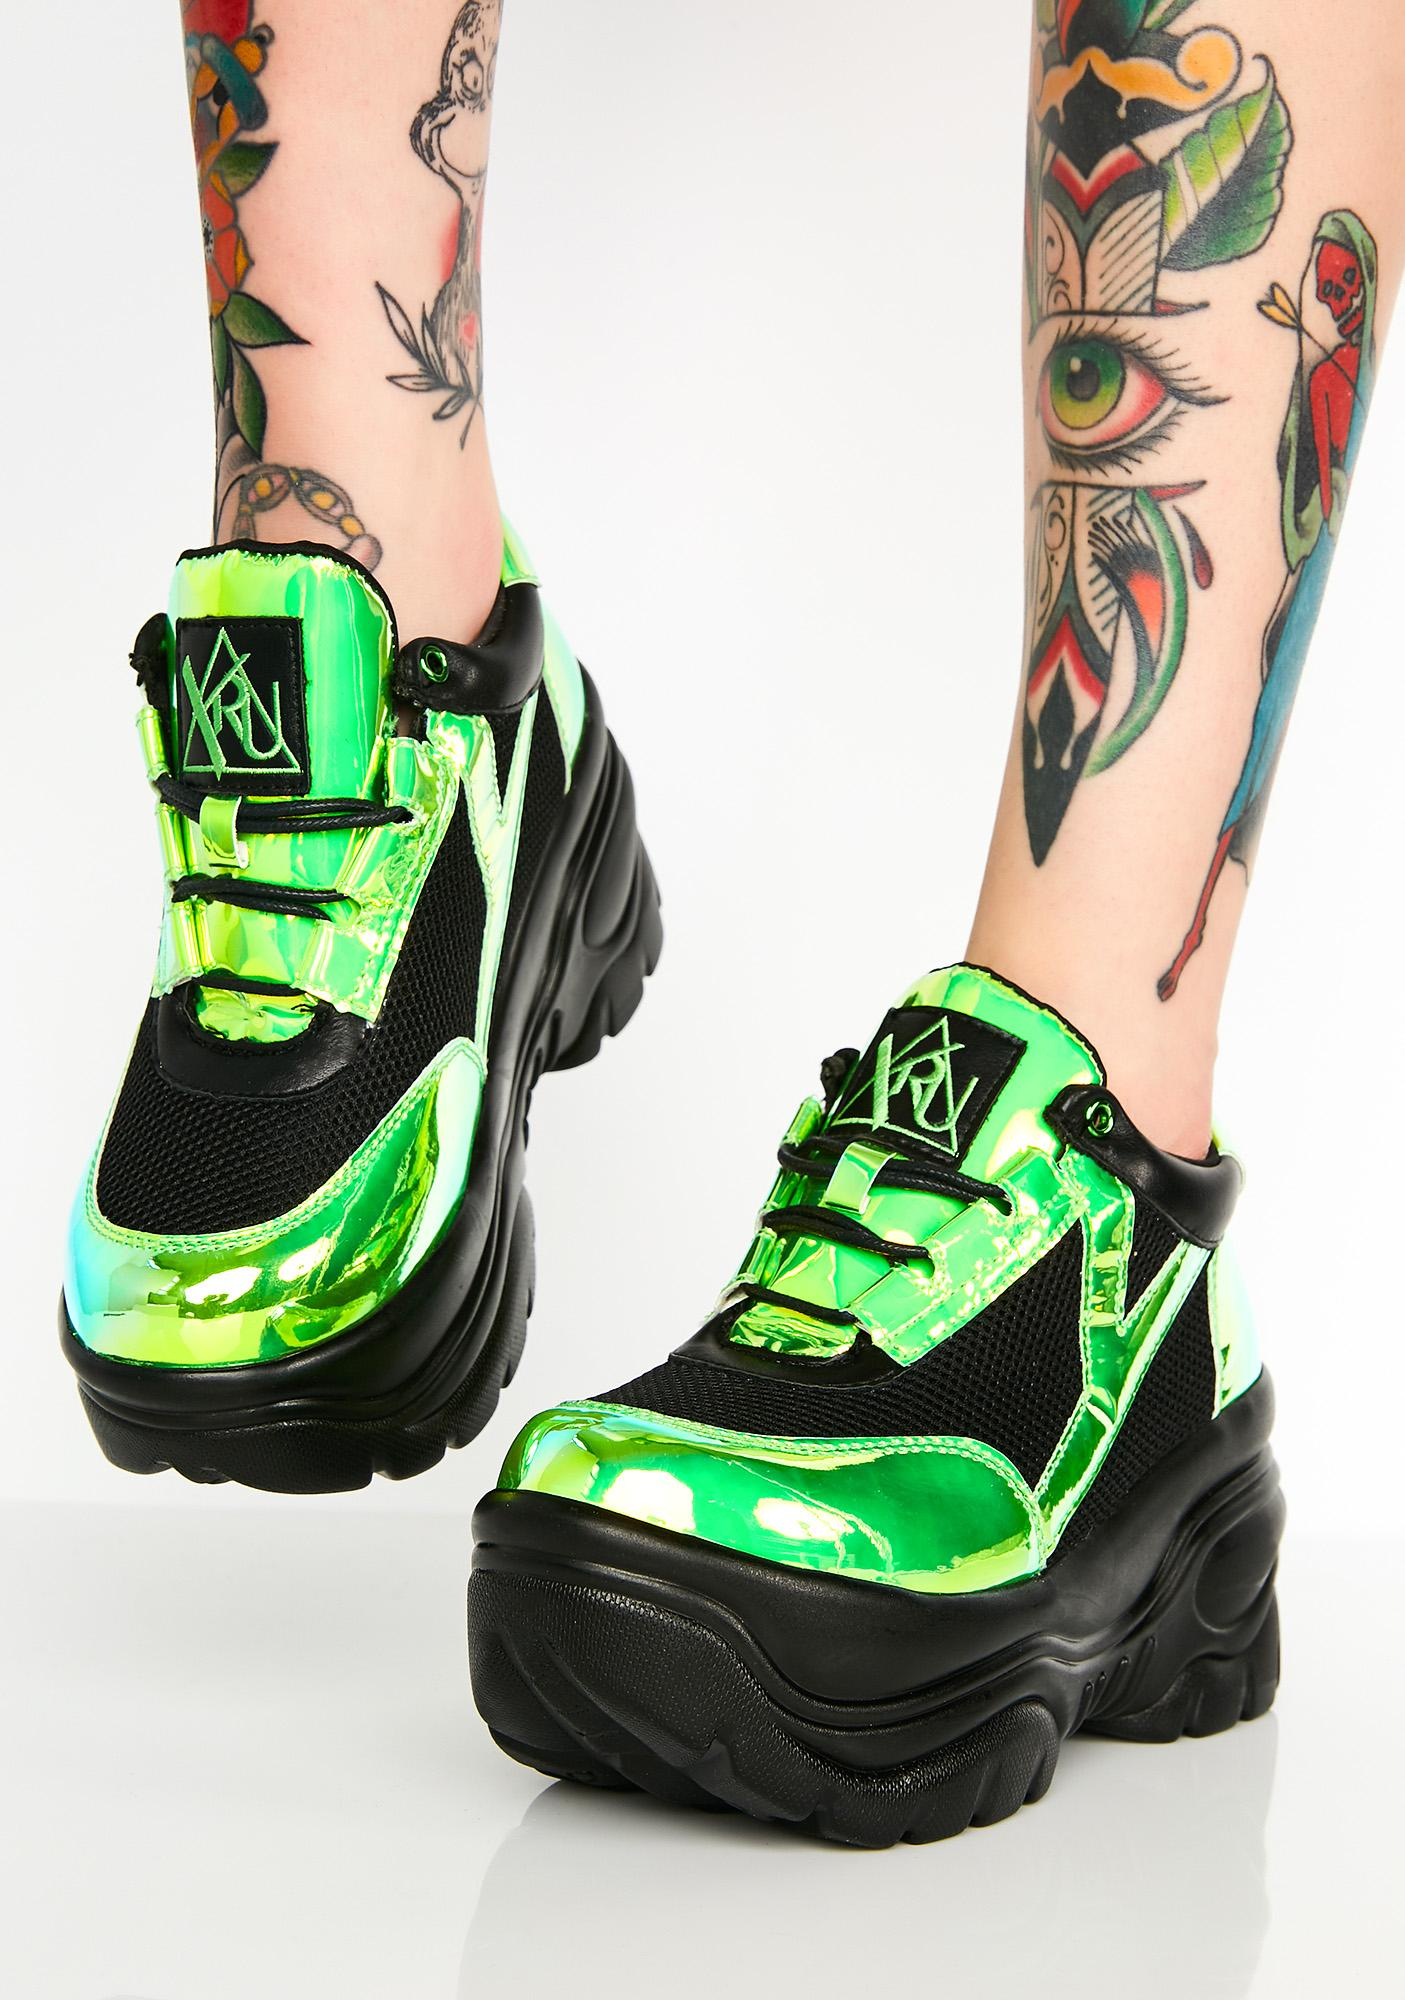 Y.R.U. Kush Matrixx Platform Sneakers